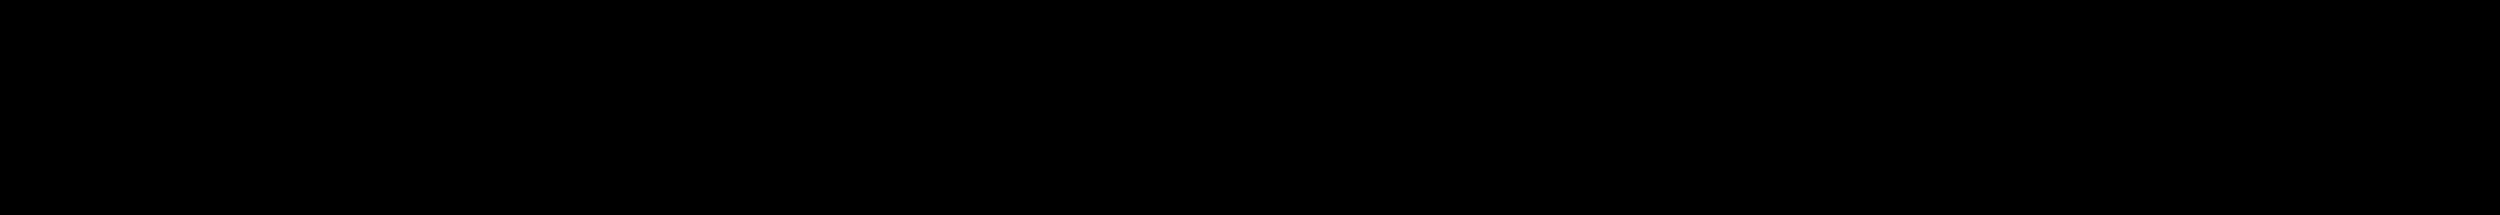 Burro_logo_black.png